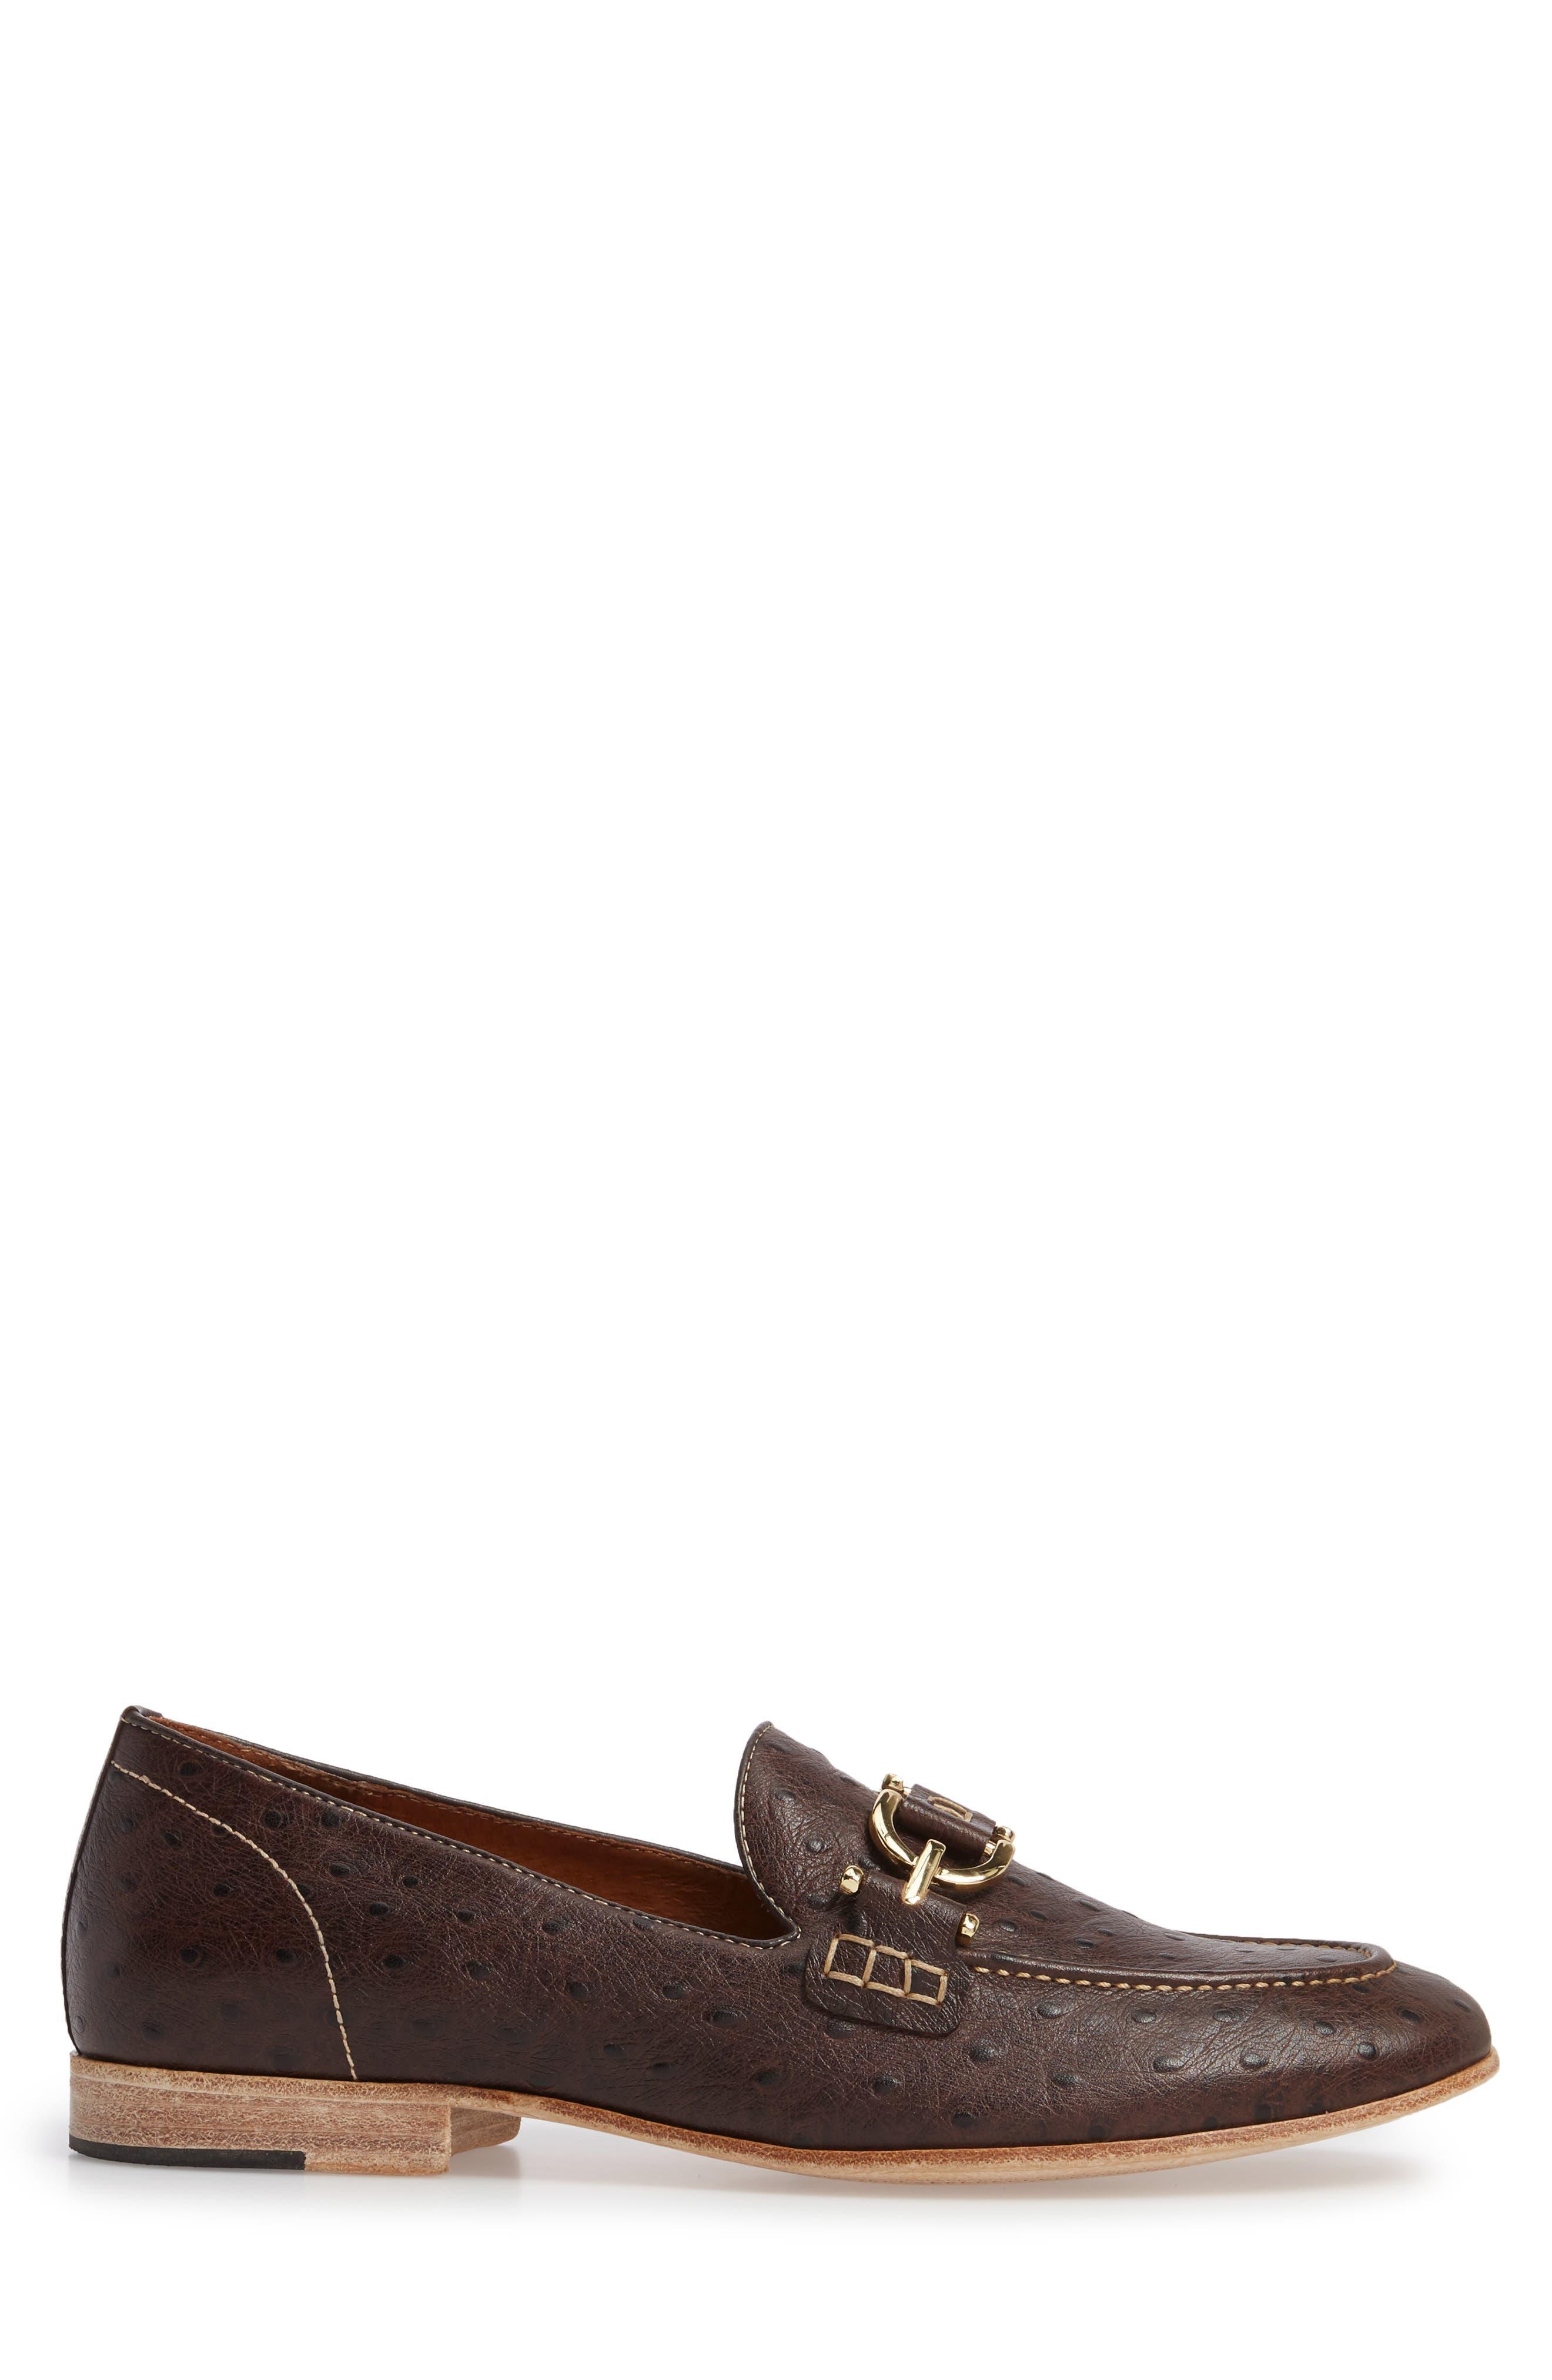 Moritz Apron Toe Bit Loafer,                             Alternate thumbnail 3, color,                             Brown Leather